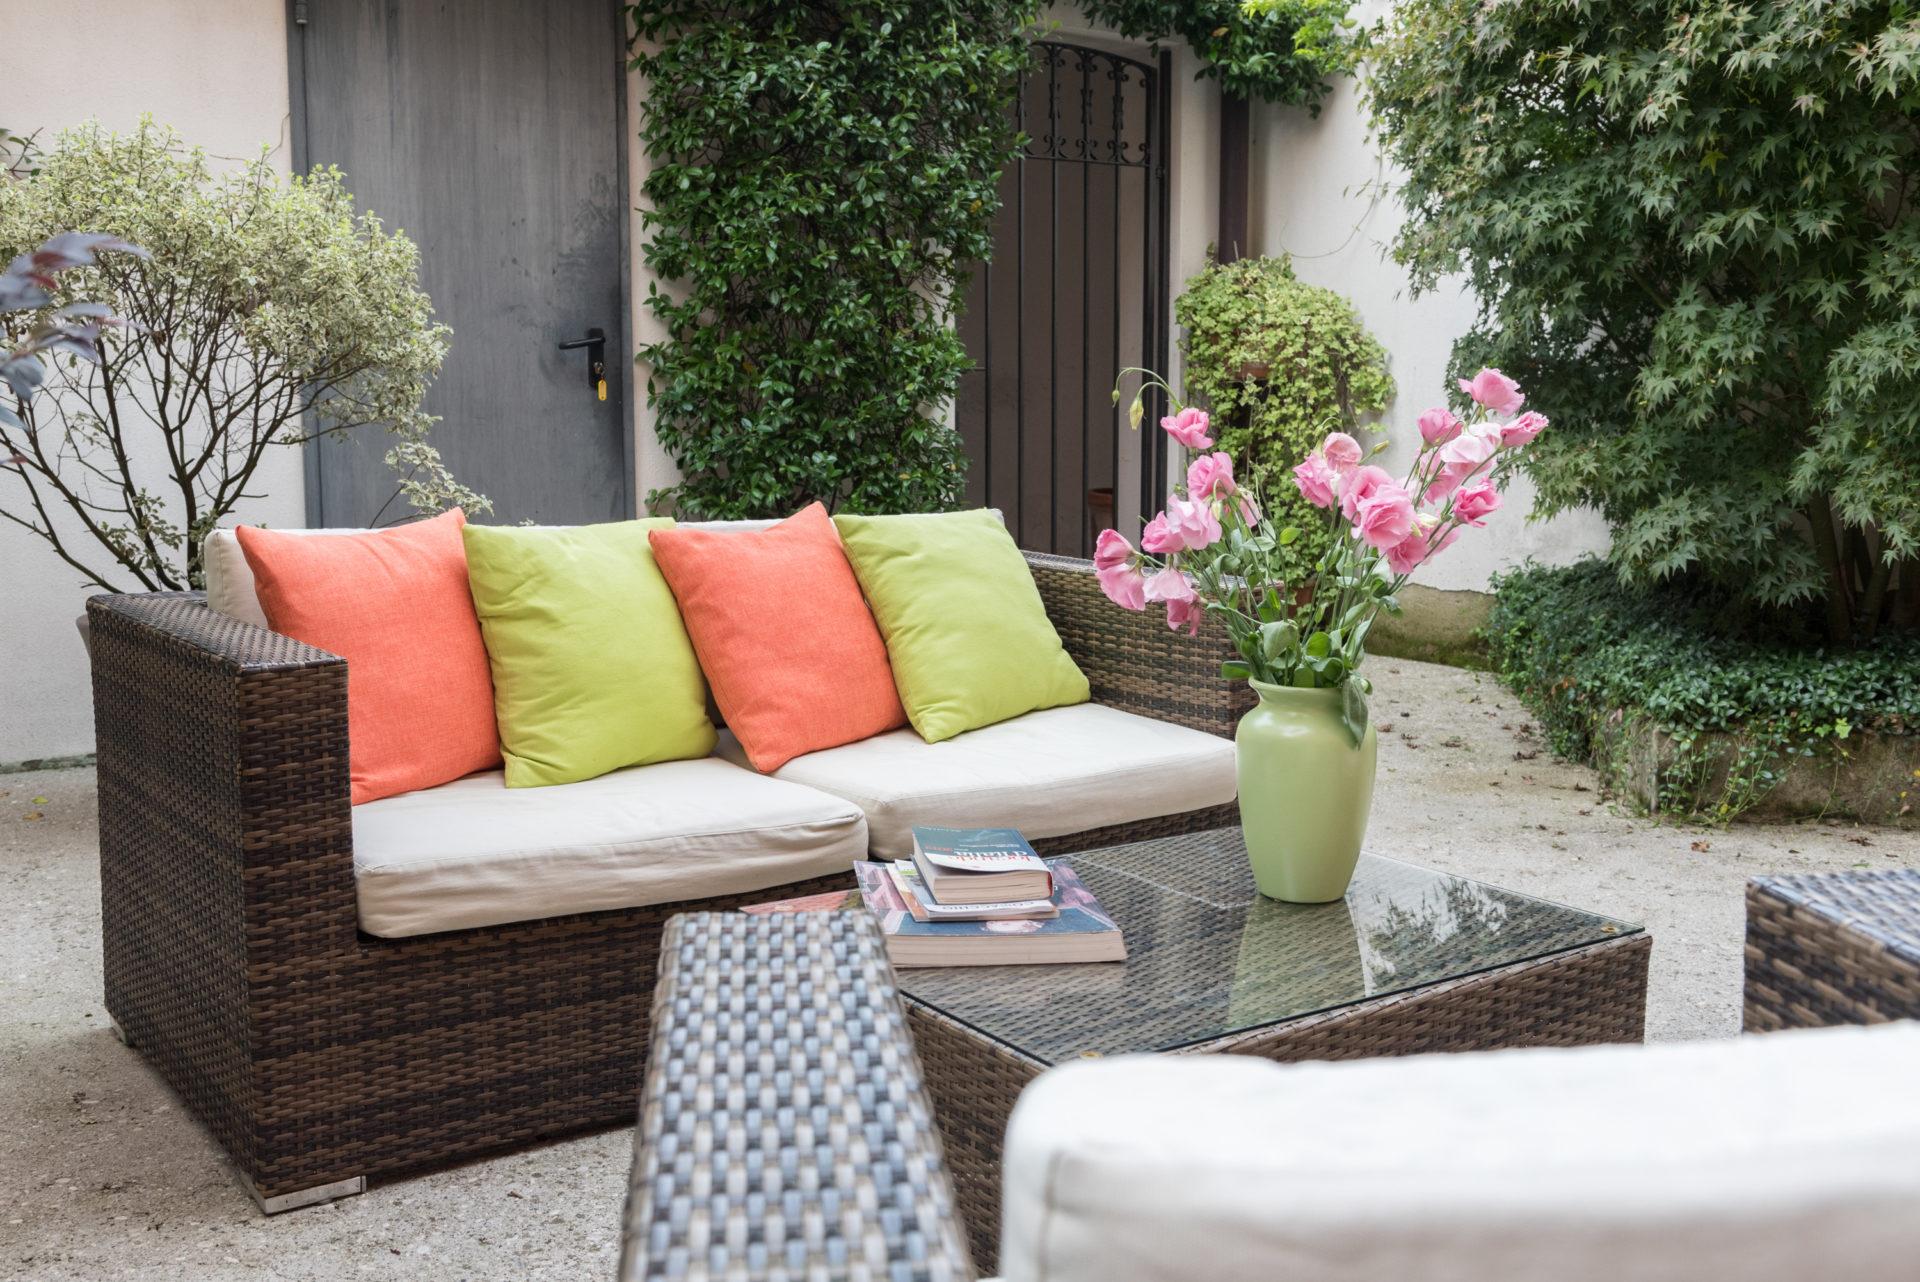 giardino corte interna outdoor relax patio